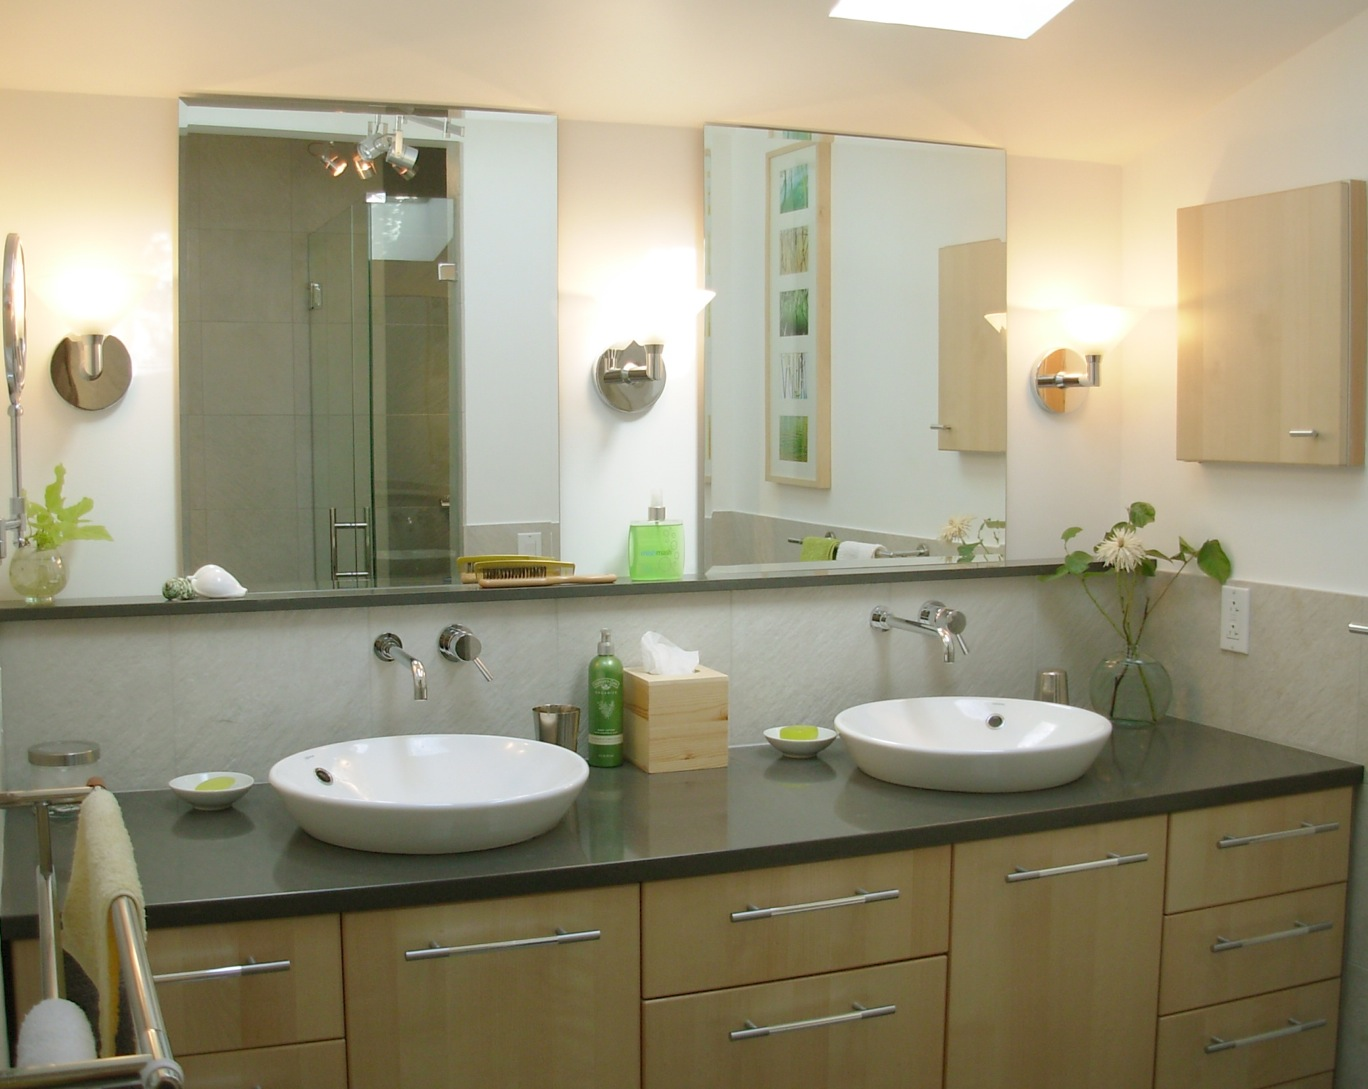 Double Sink Bathroom Vanity 6201